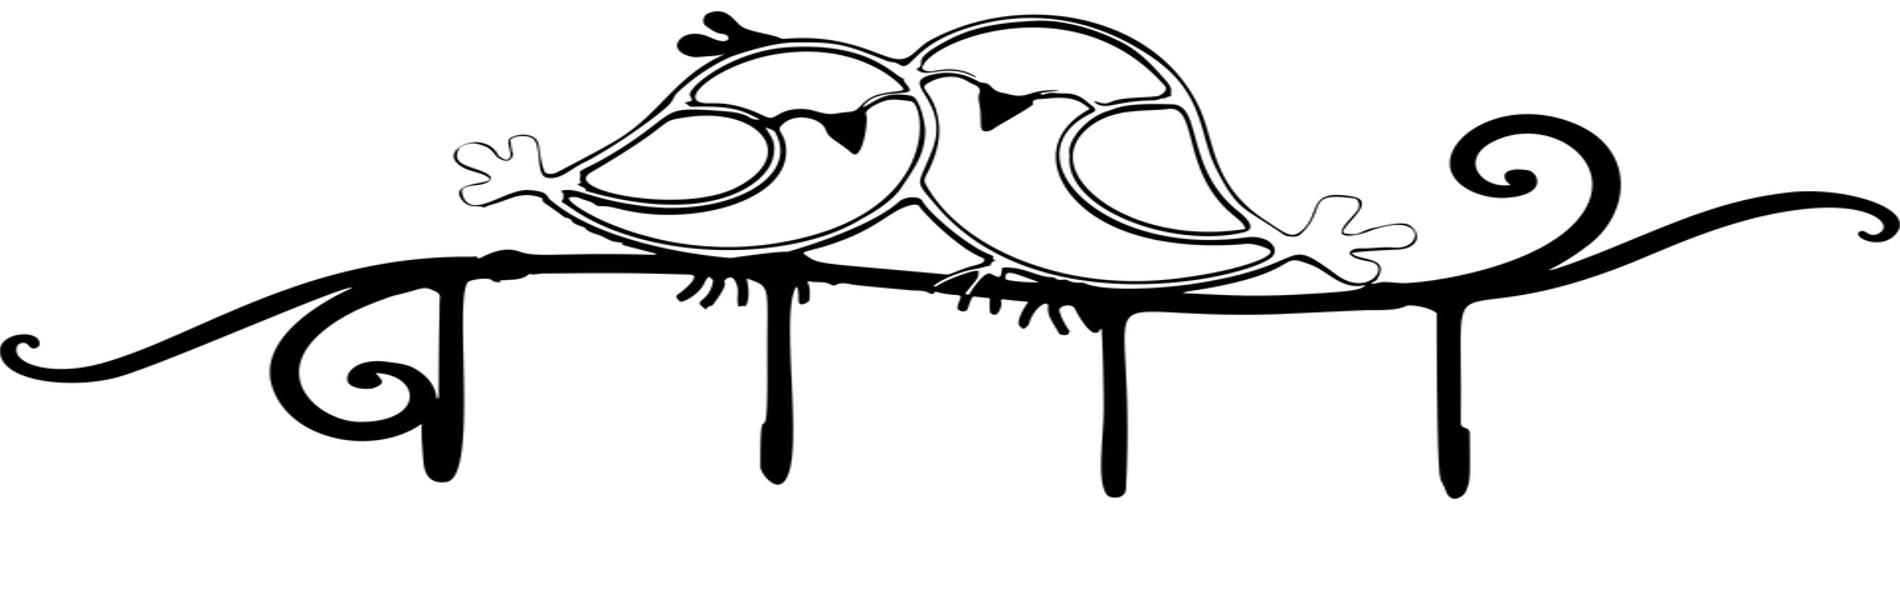 Passar rindo (amor de passarinho)